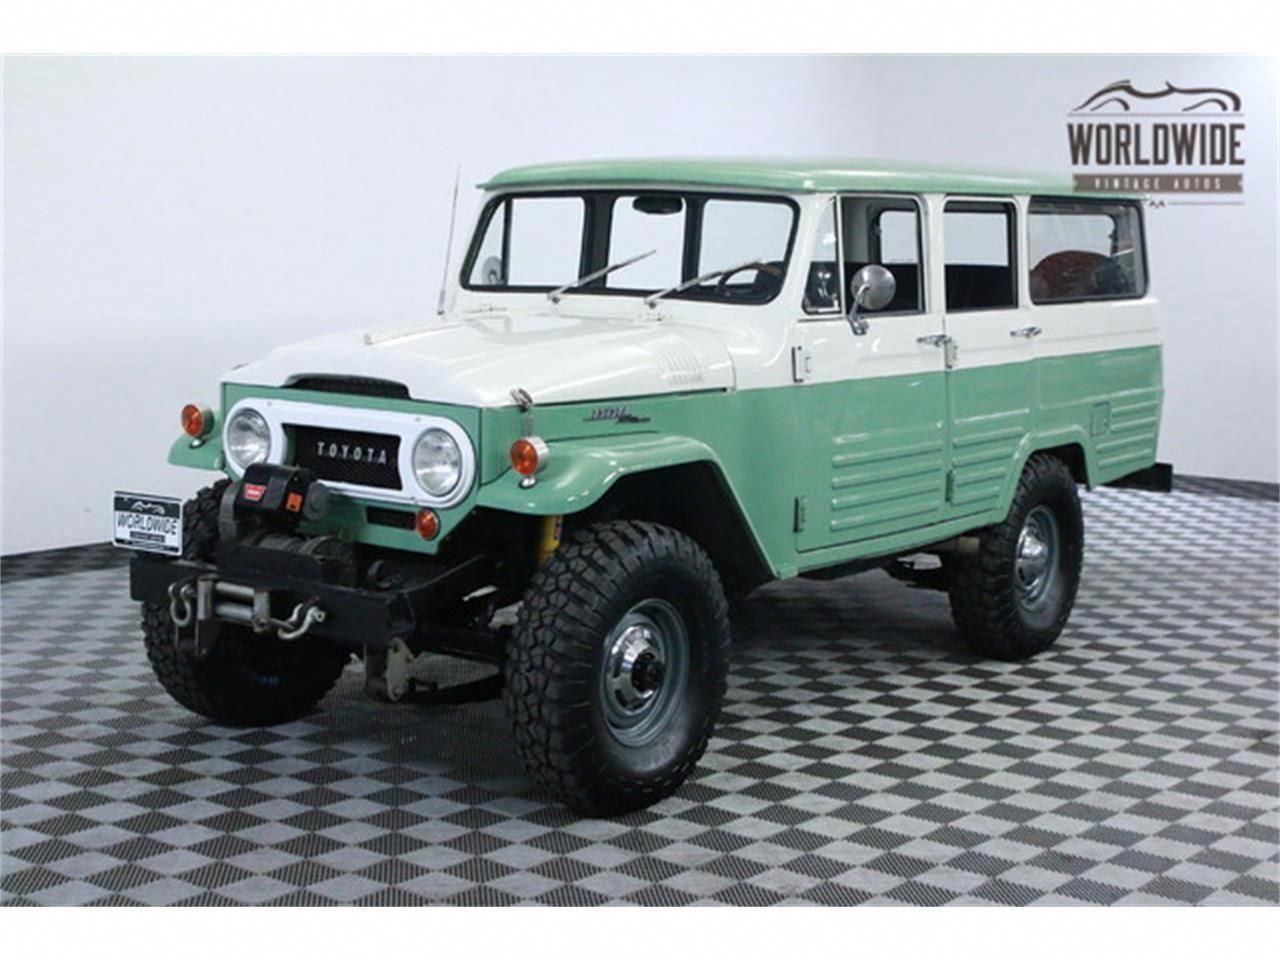 1966 Toyota Land Cruiser Fj45 For Sale Classiccars Com Cc 921181 Toyotaclassiccars Toyota Land Cruiser Land Cruiser Toyota